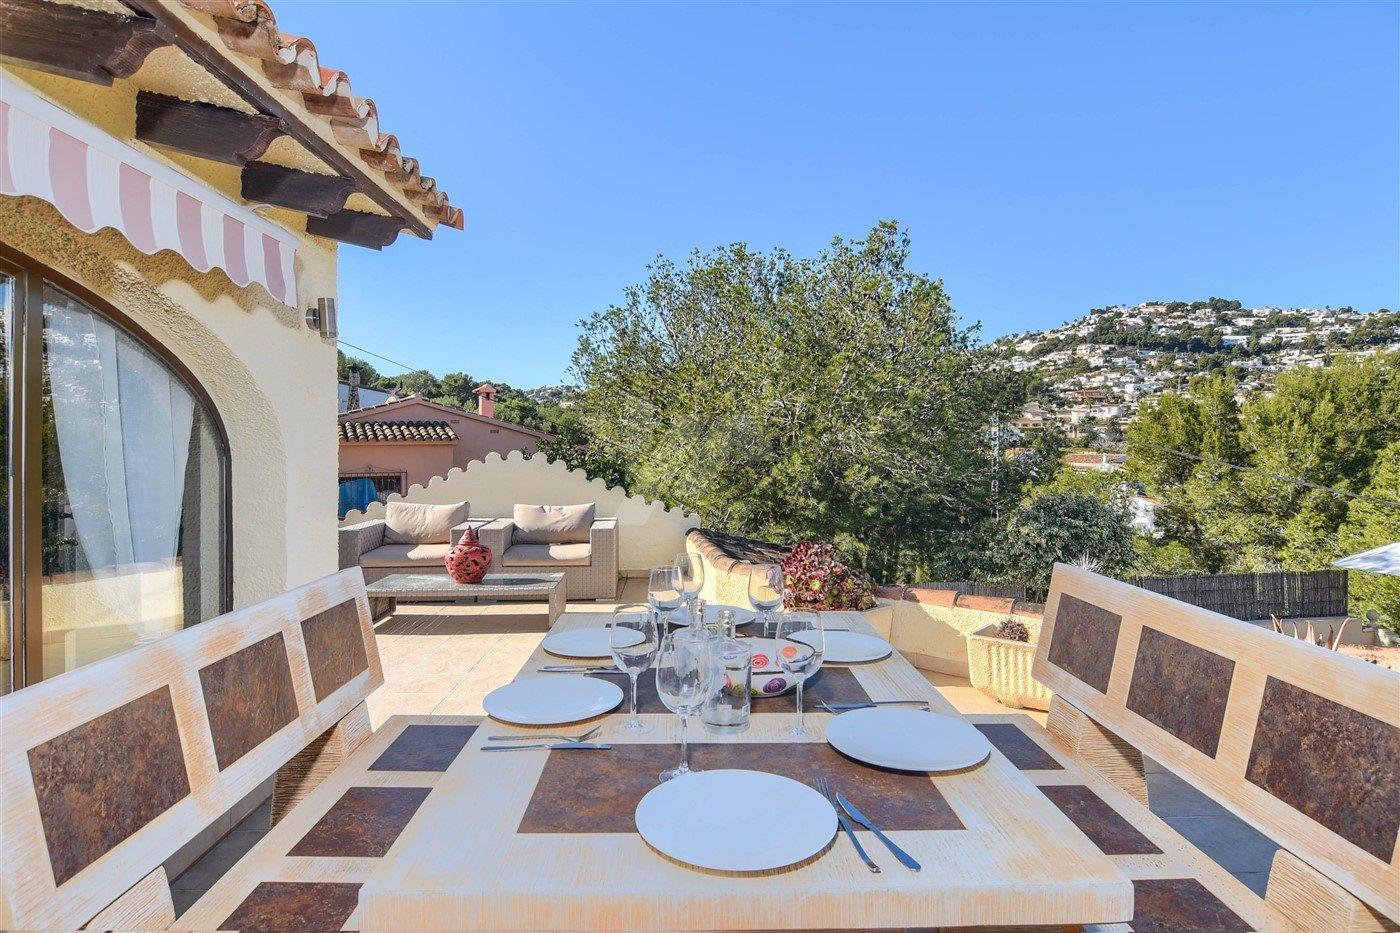 Villa for sale in Moraira, walking distance, Costa Blanca.